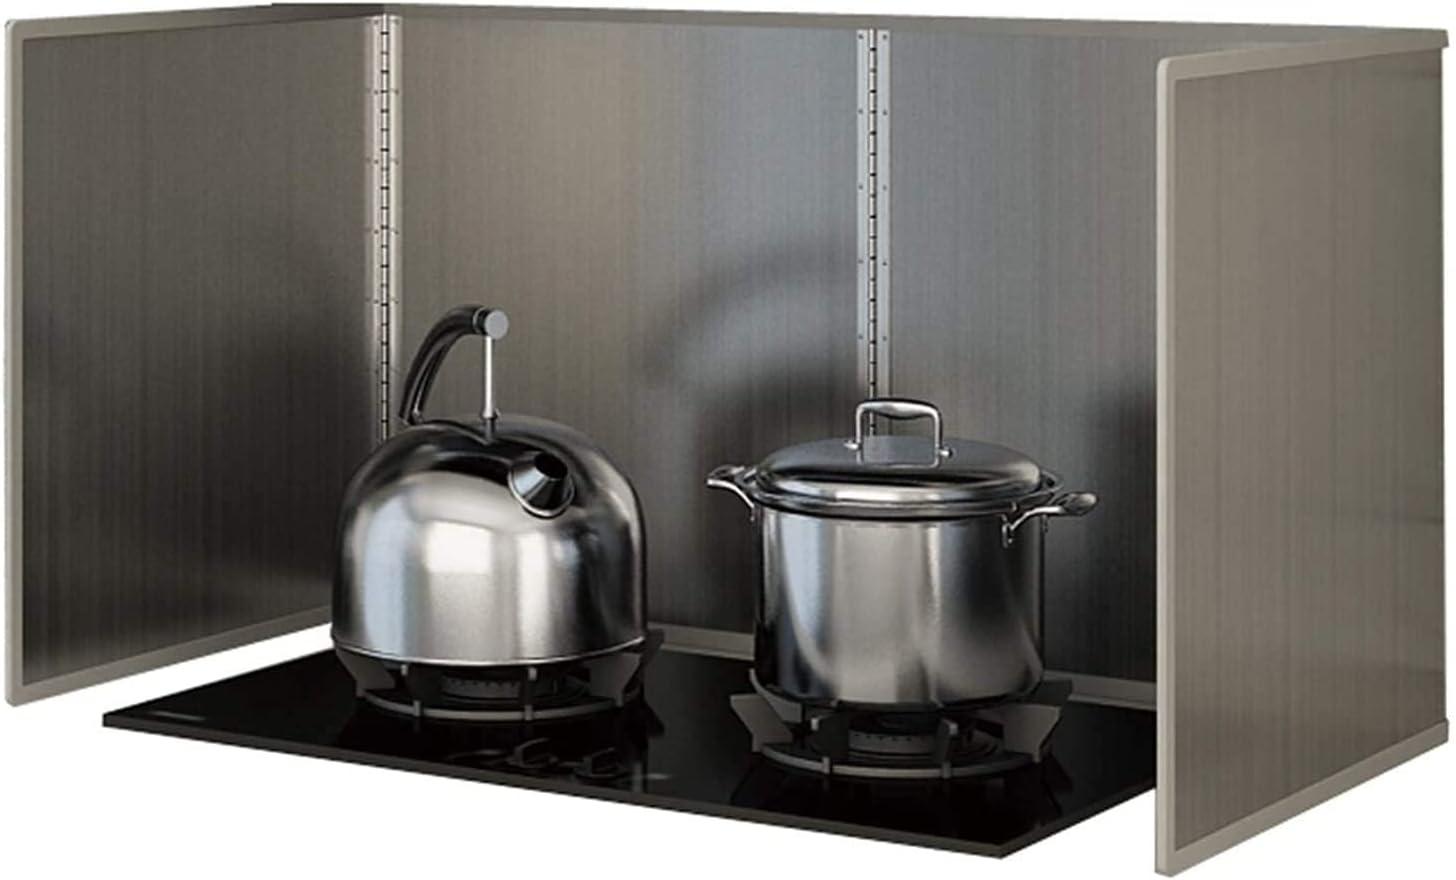 Overseas parallel import regular item FANNISS Splatter guardKitchen Dedication Clean Cooker G Spill-Resistant Gas